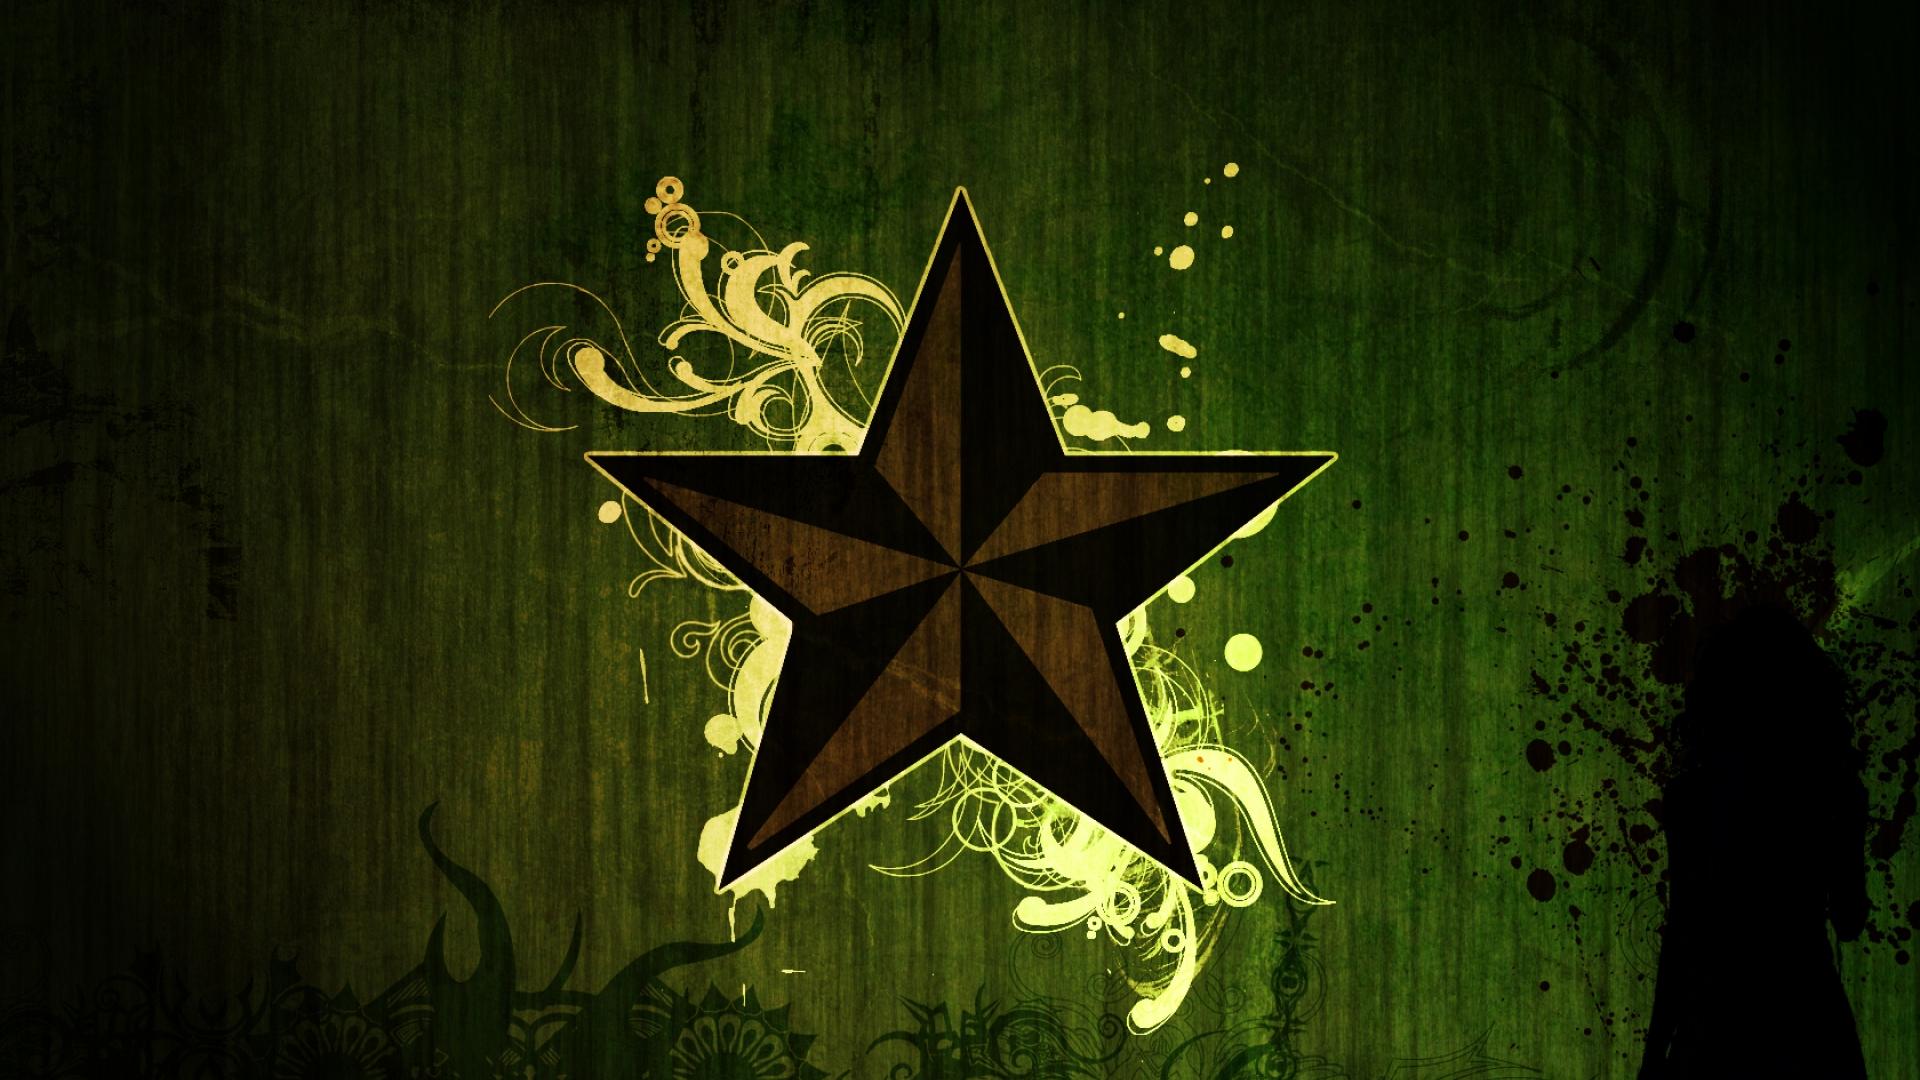 Grunge star wallpaper